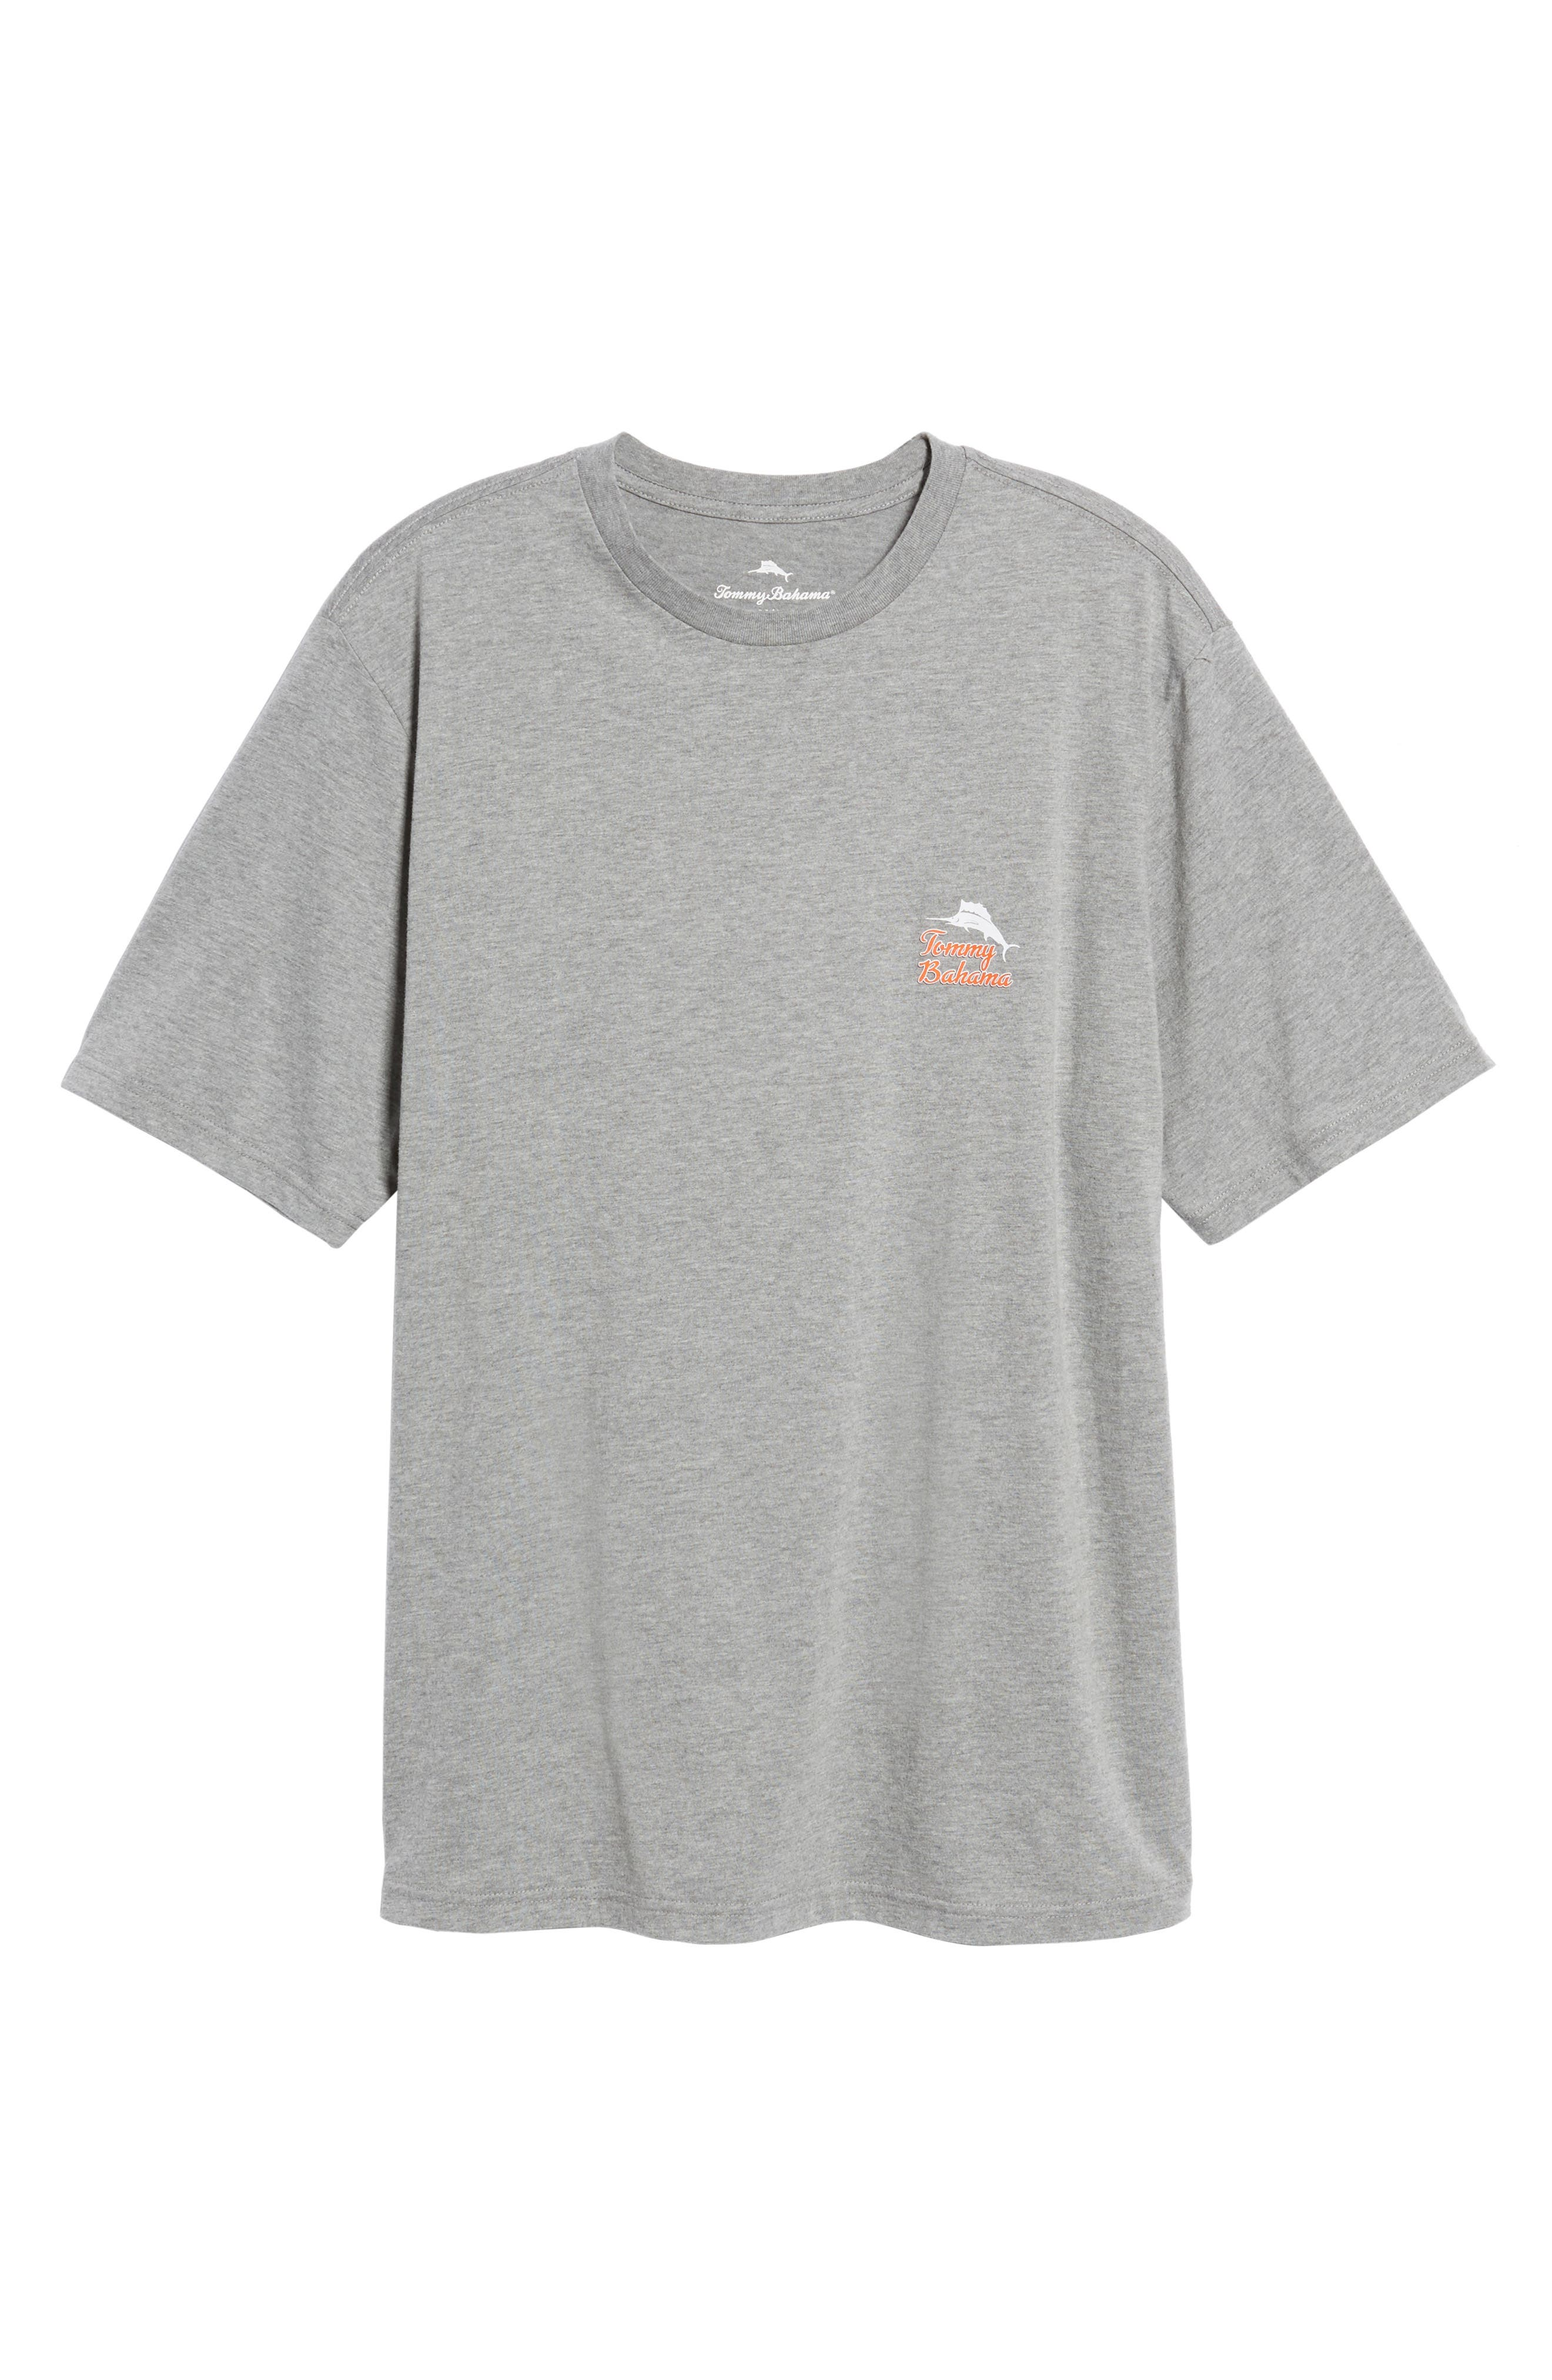 Morning Anchor Graphic T-Shirt,                             Alternate thumbnail 6, color,                             020